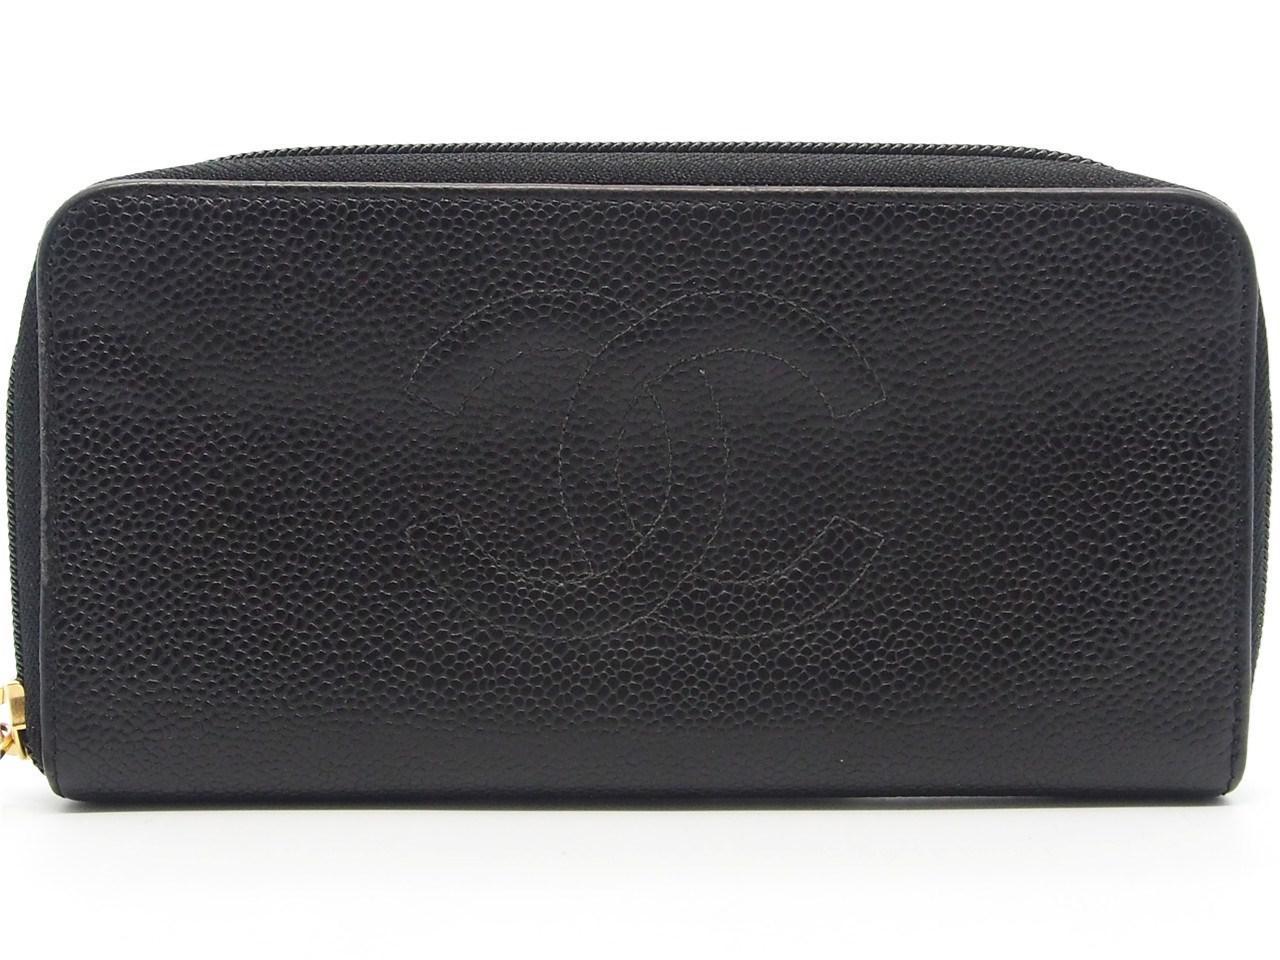 2013ad5b Chanel Authentic Black Caviar Leather Cc Logo Timeless Zippy Wallet  17017526ck